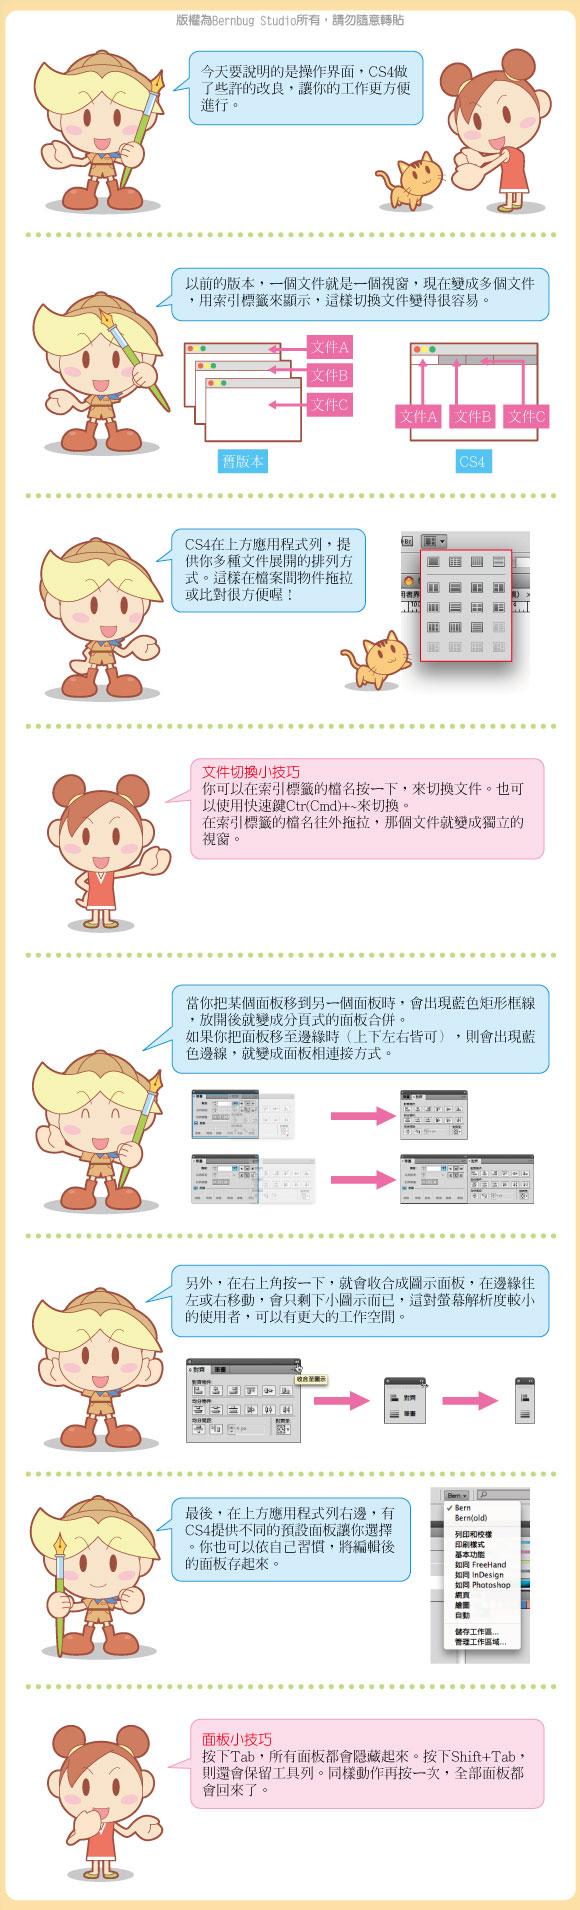 lesson4.jpg